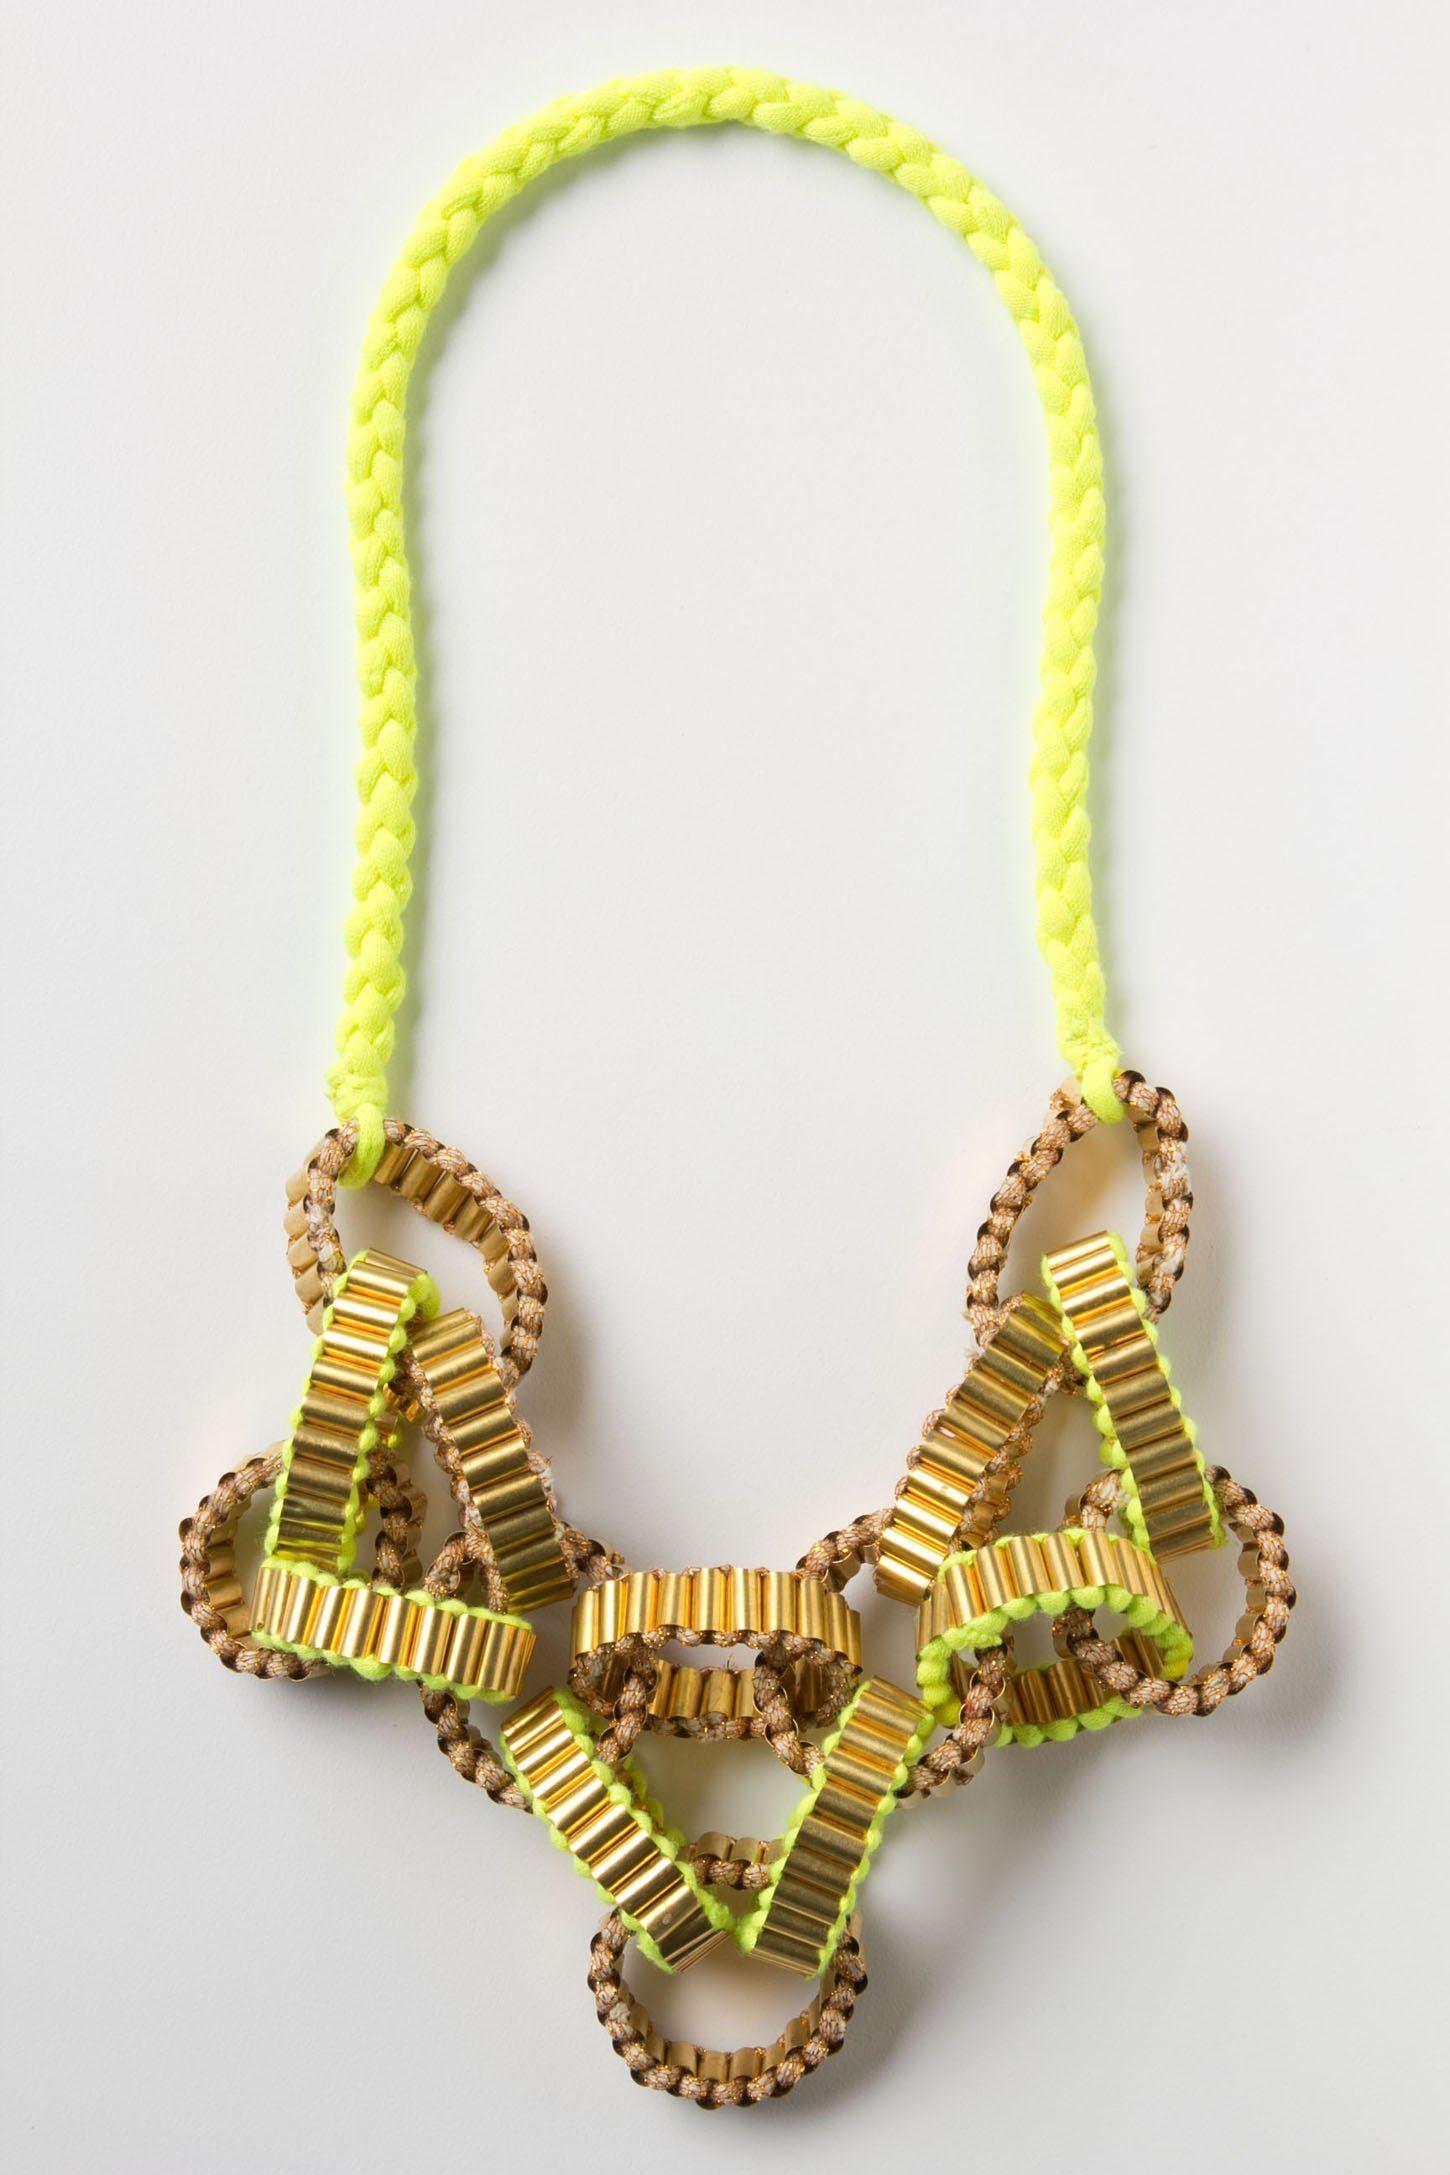 Crepe Chain Neon - Anthropologie.com